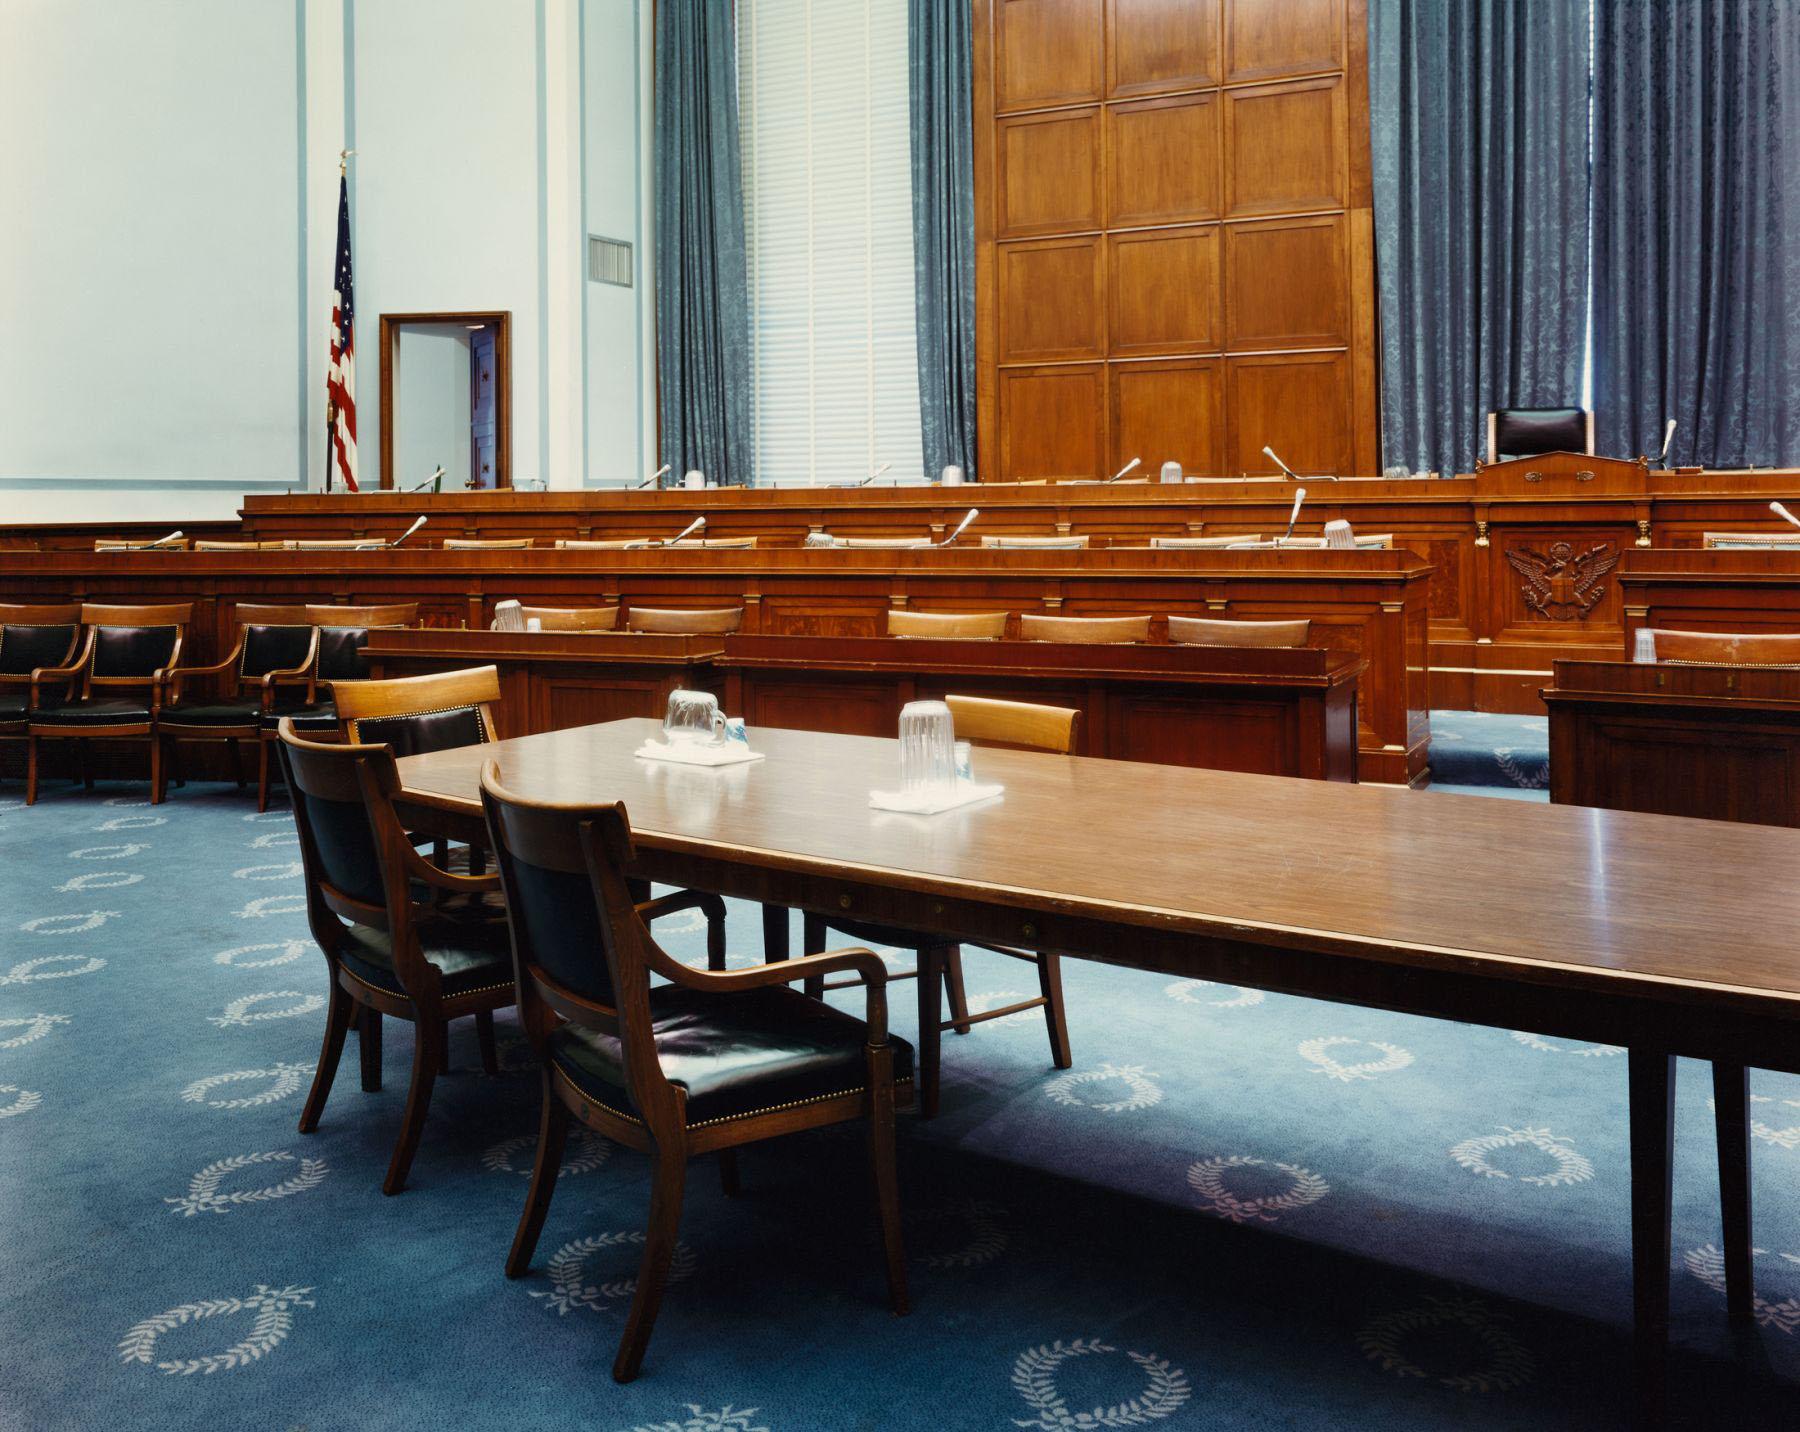 Room 2154, Rayburn House Office Building, Washington, D.C., April 1995